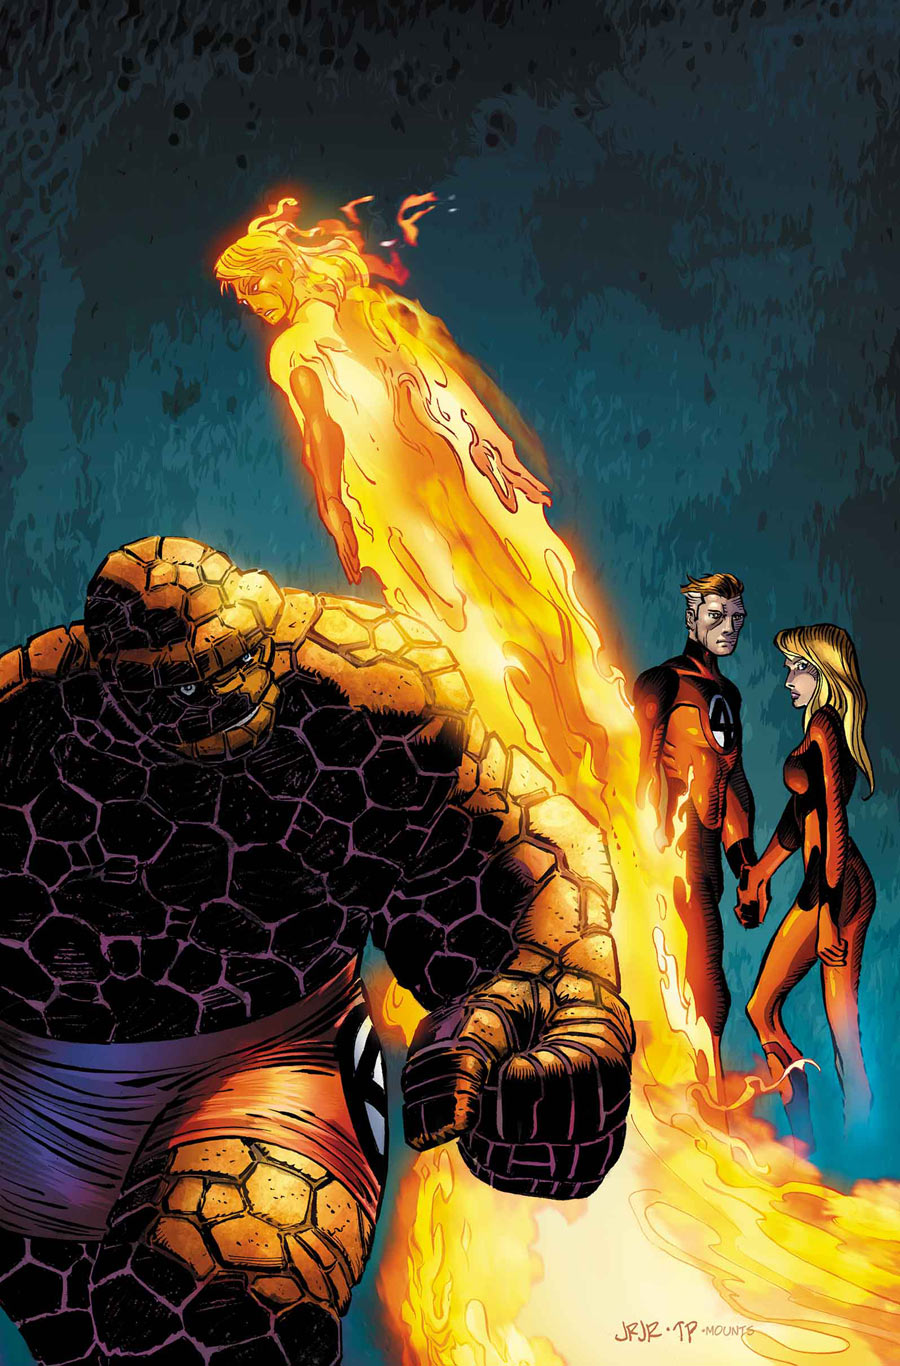 Fantastic Four #3 cover